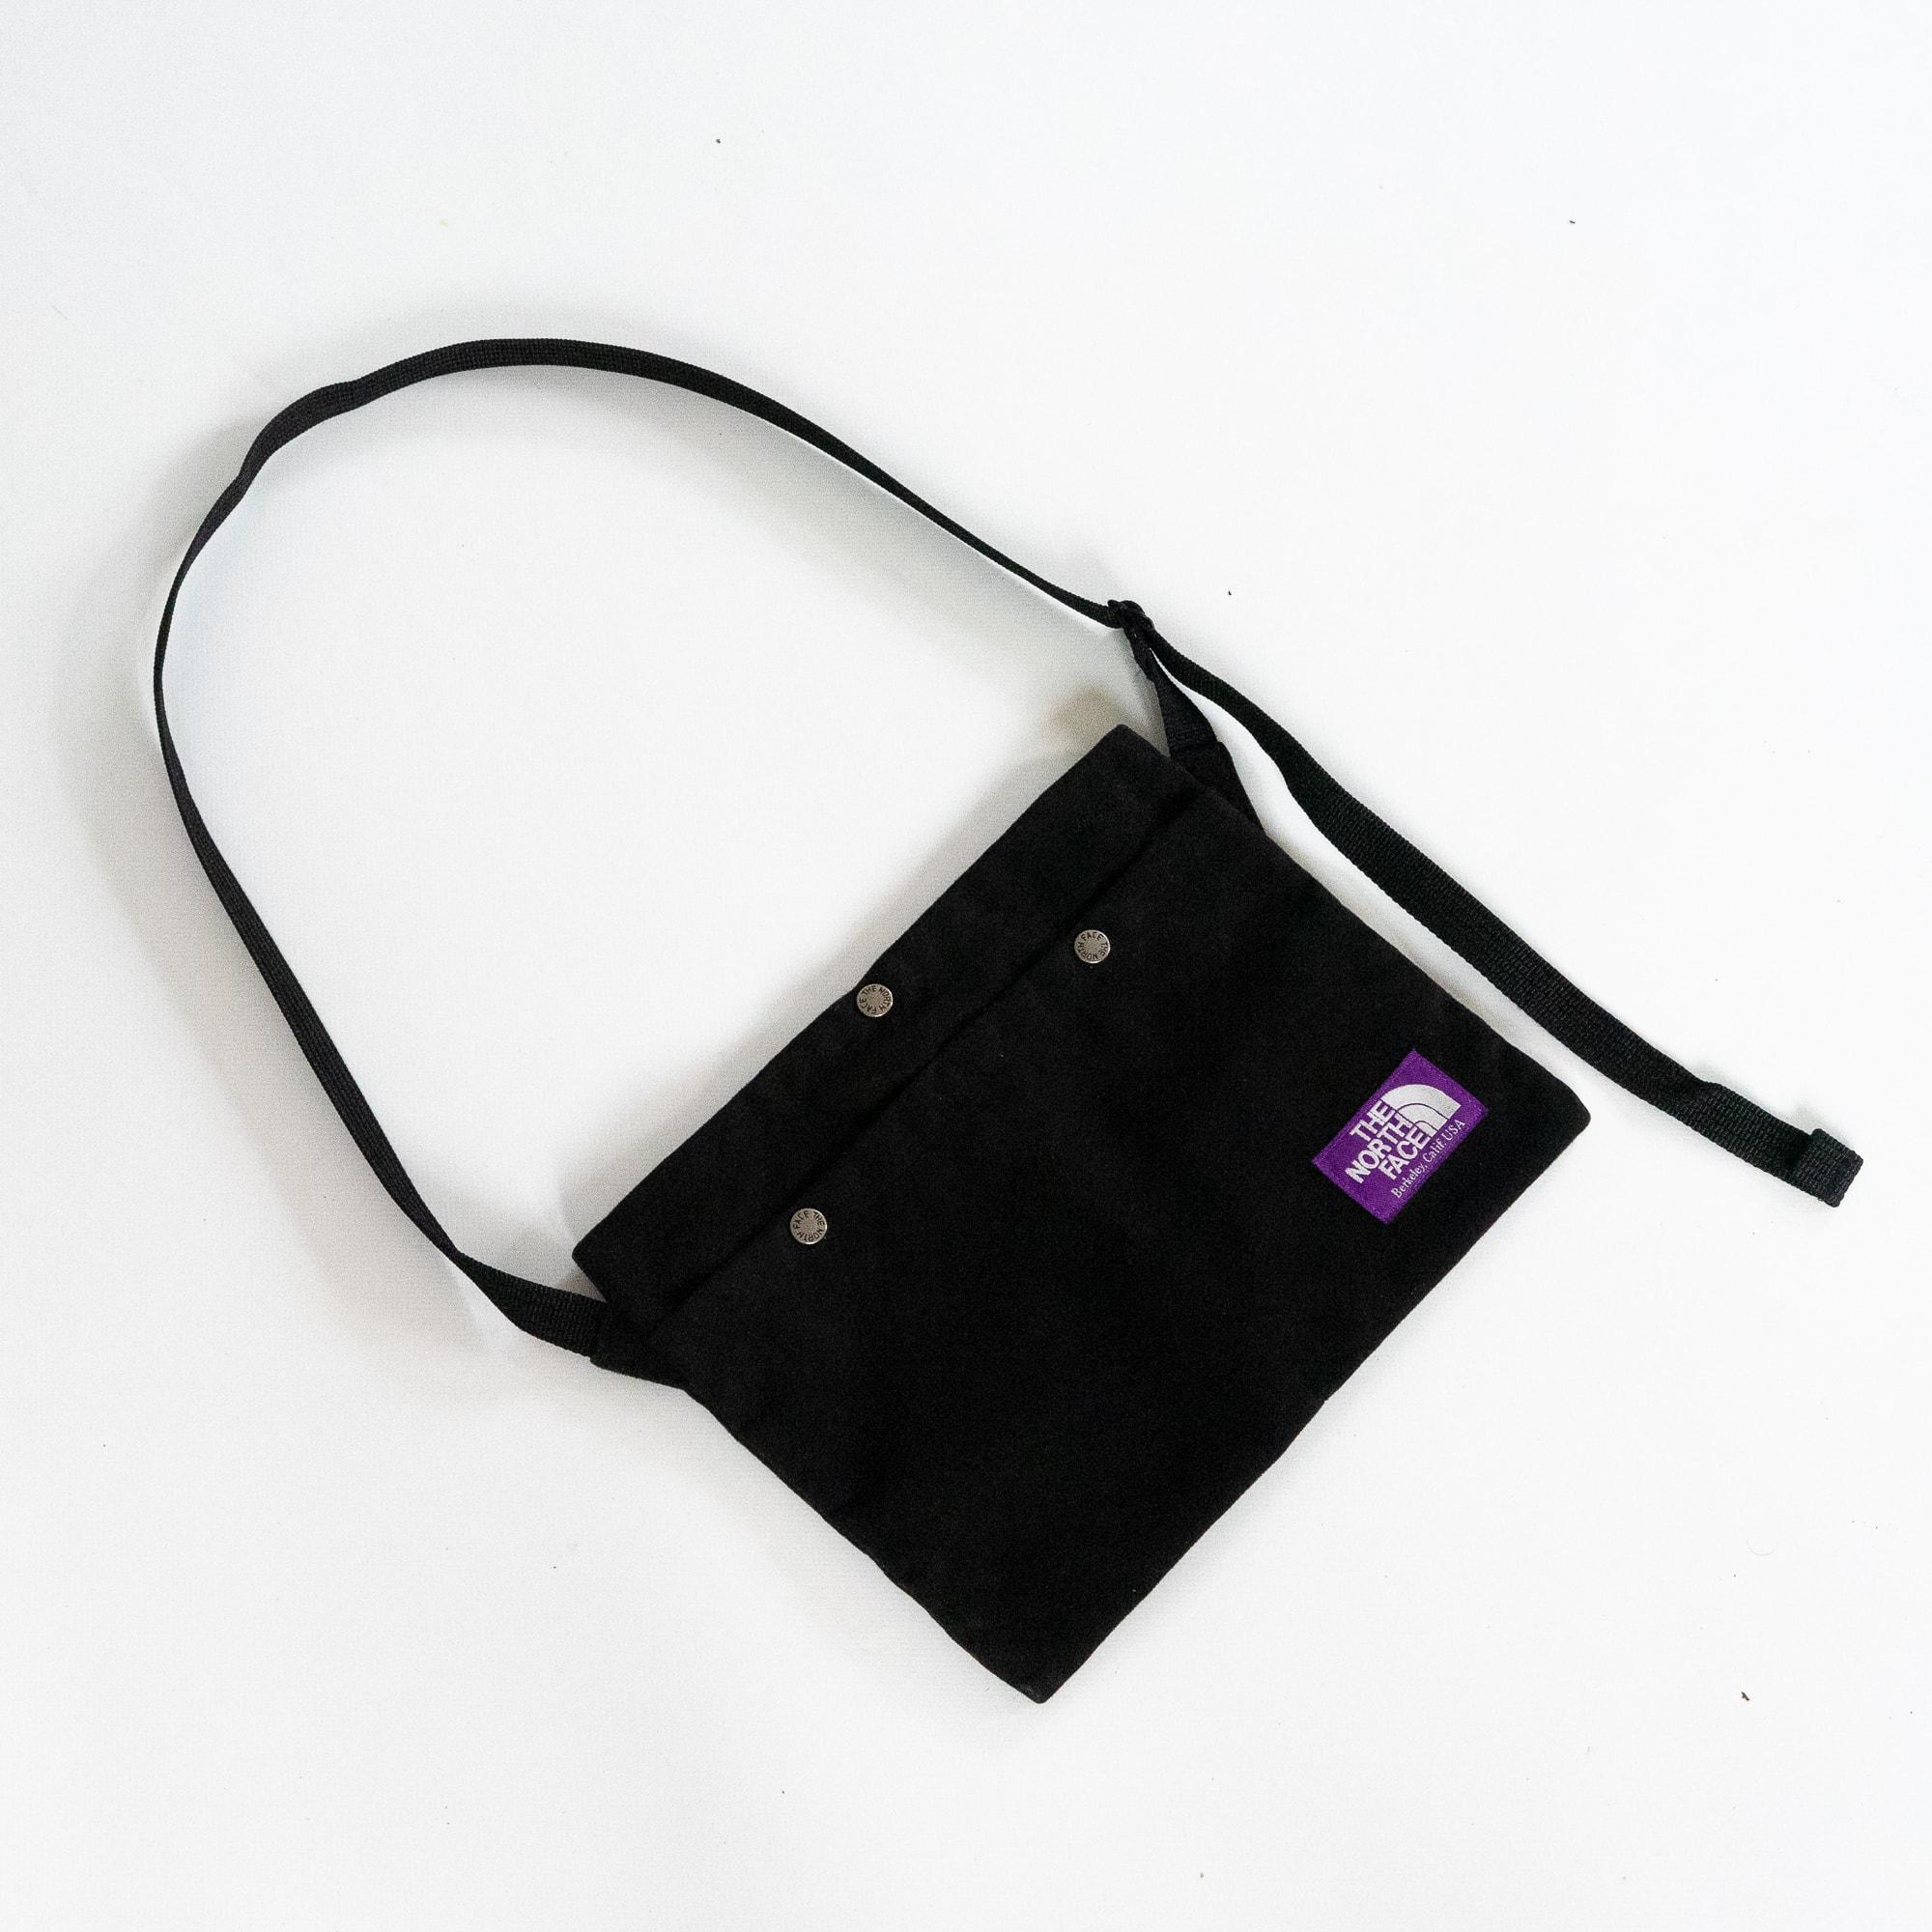 gebraucht kaufen The North Face Purple Label Crossbody Bag